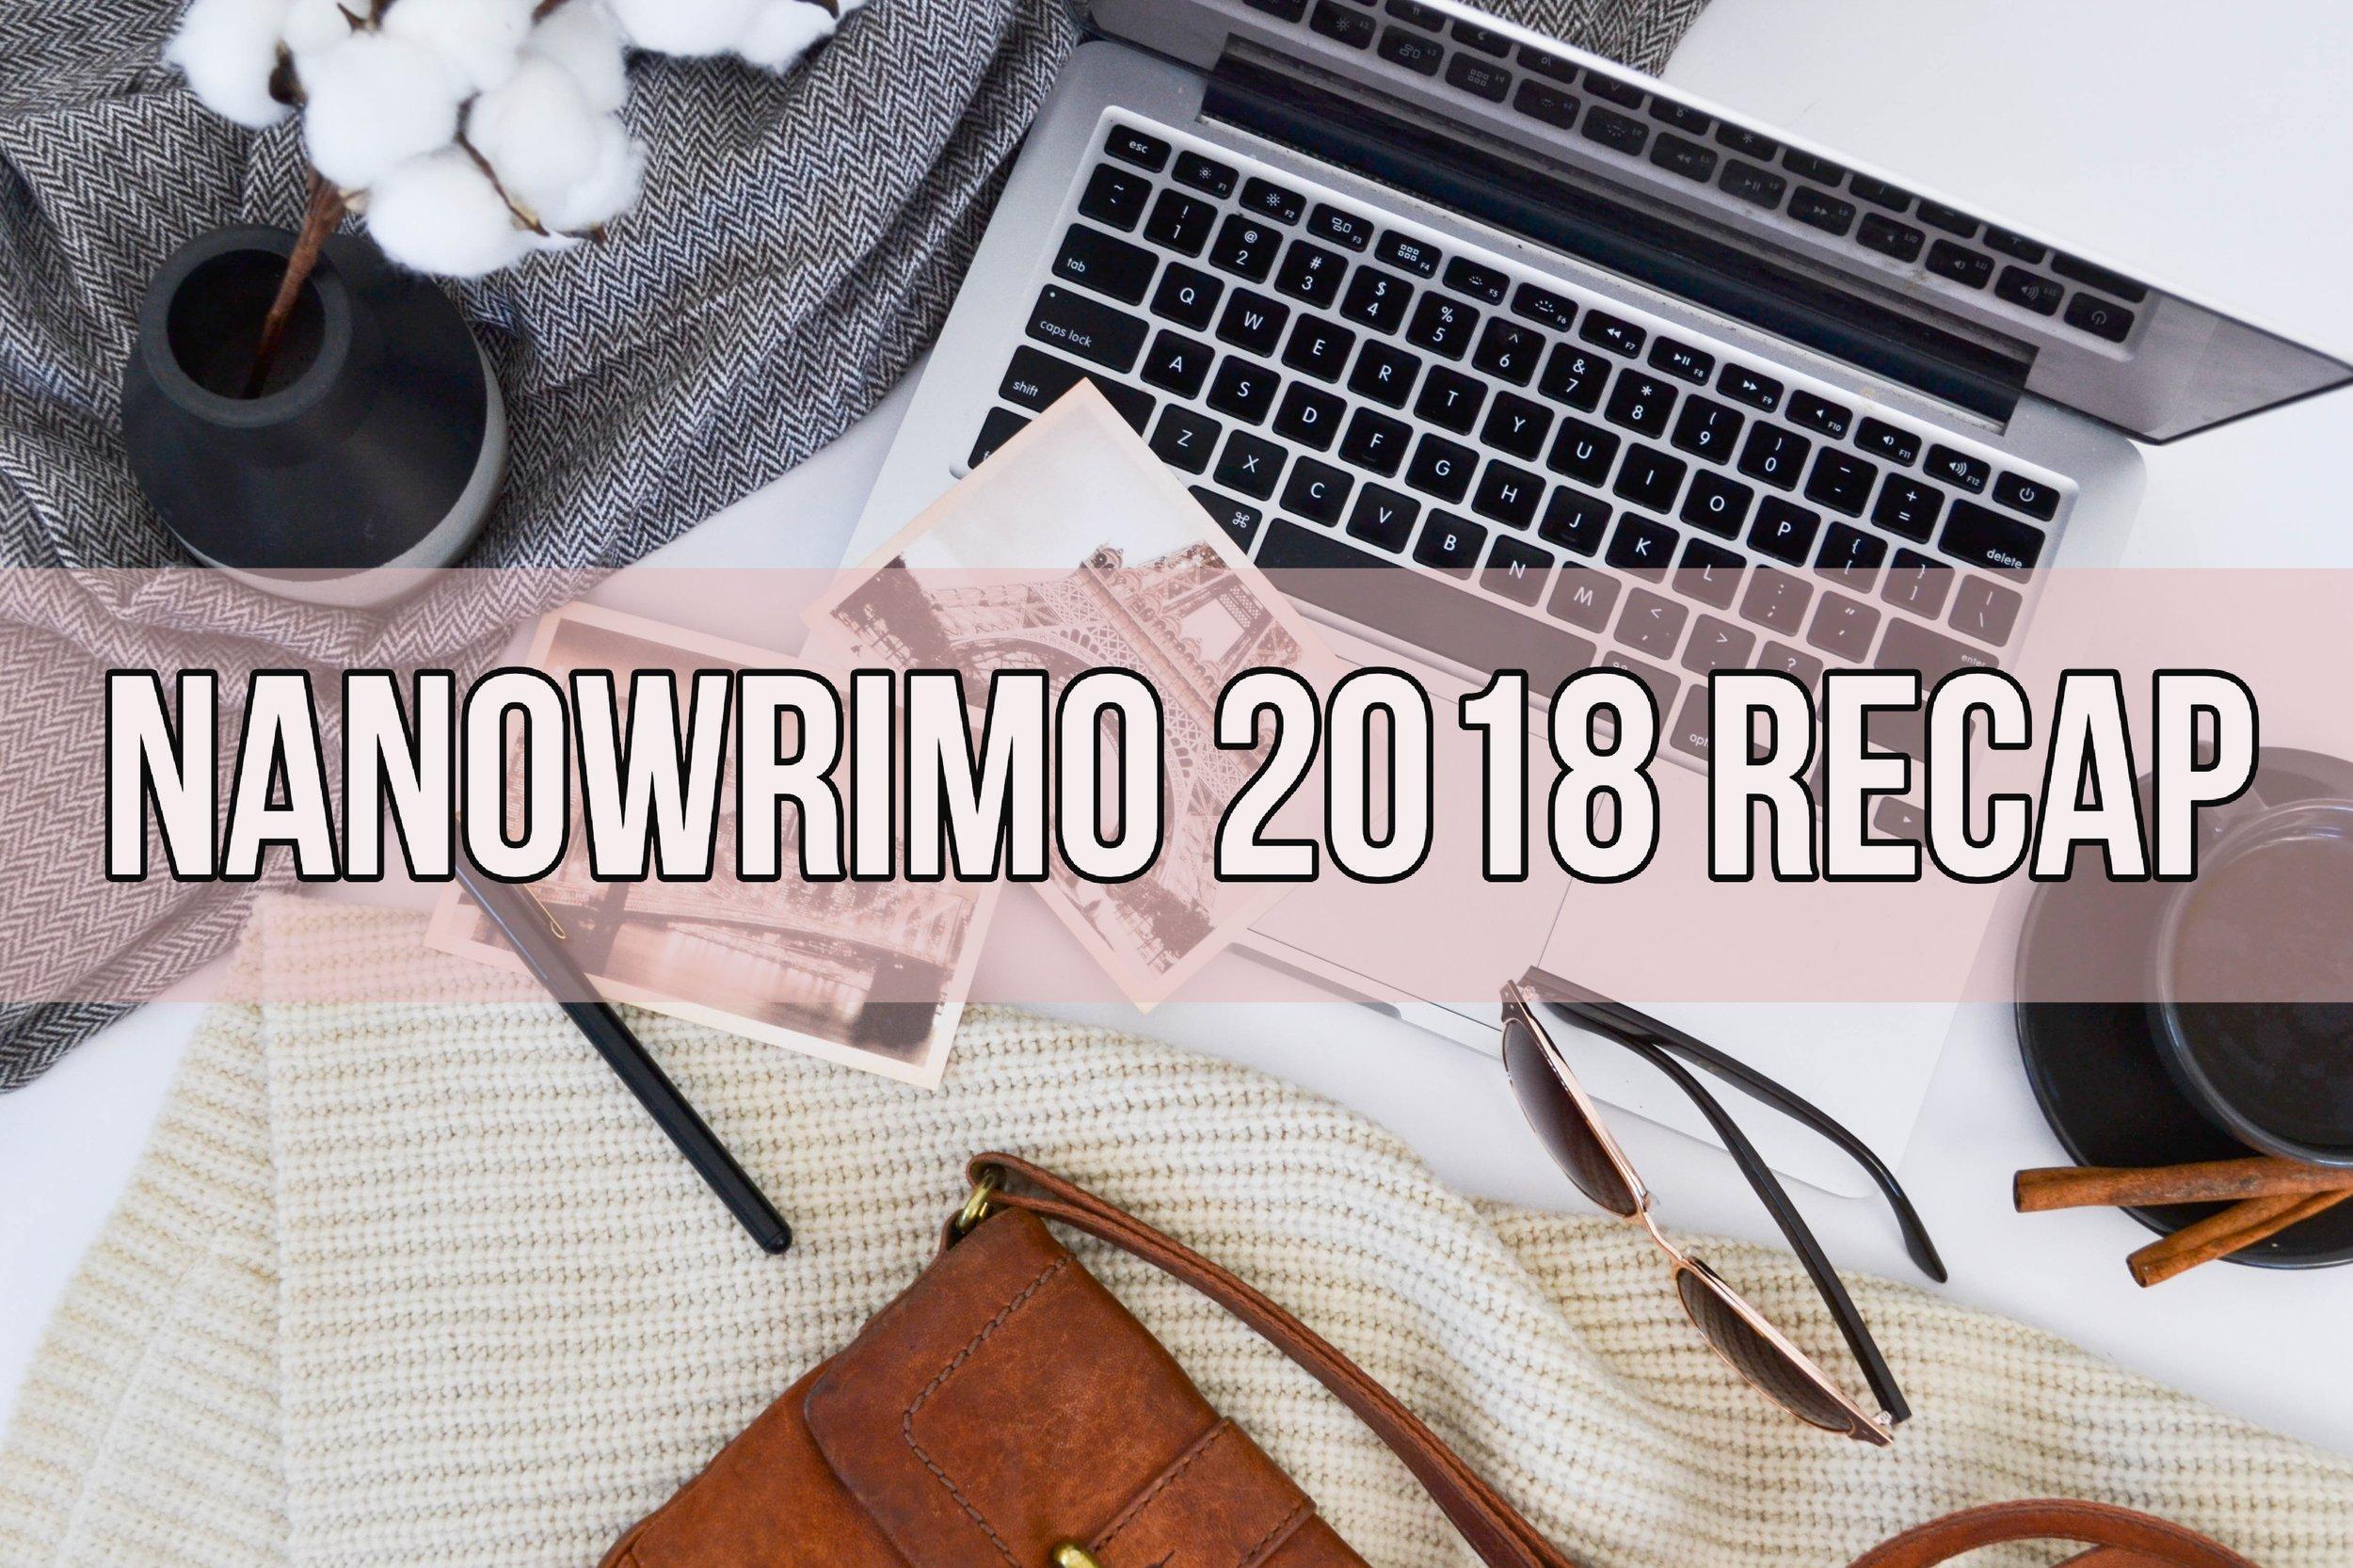 nanowrimo recap.jpg